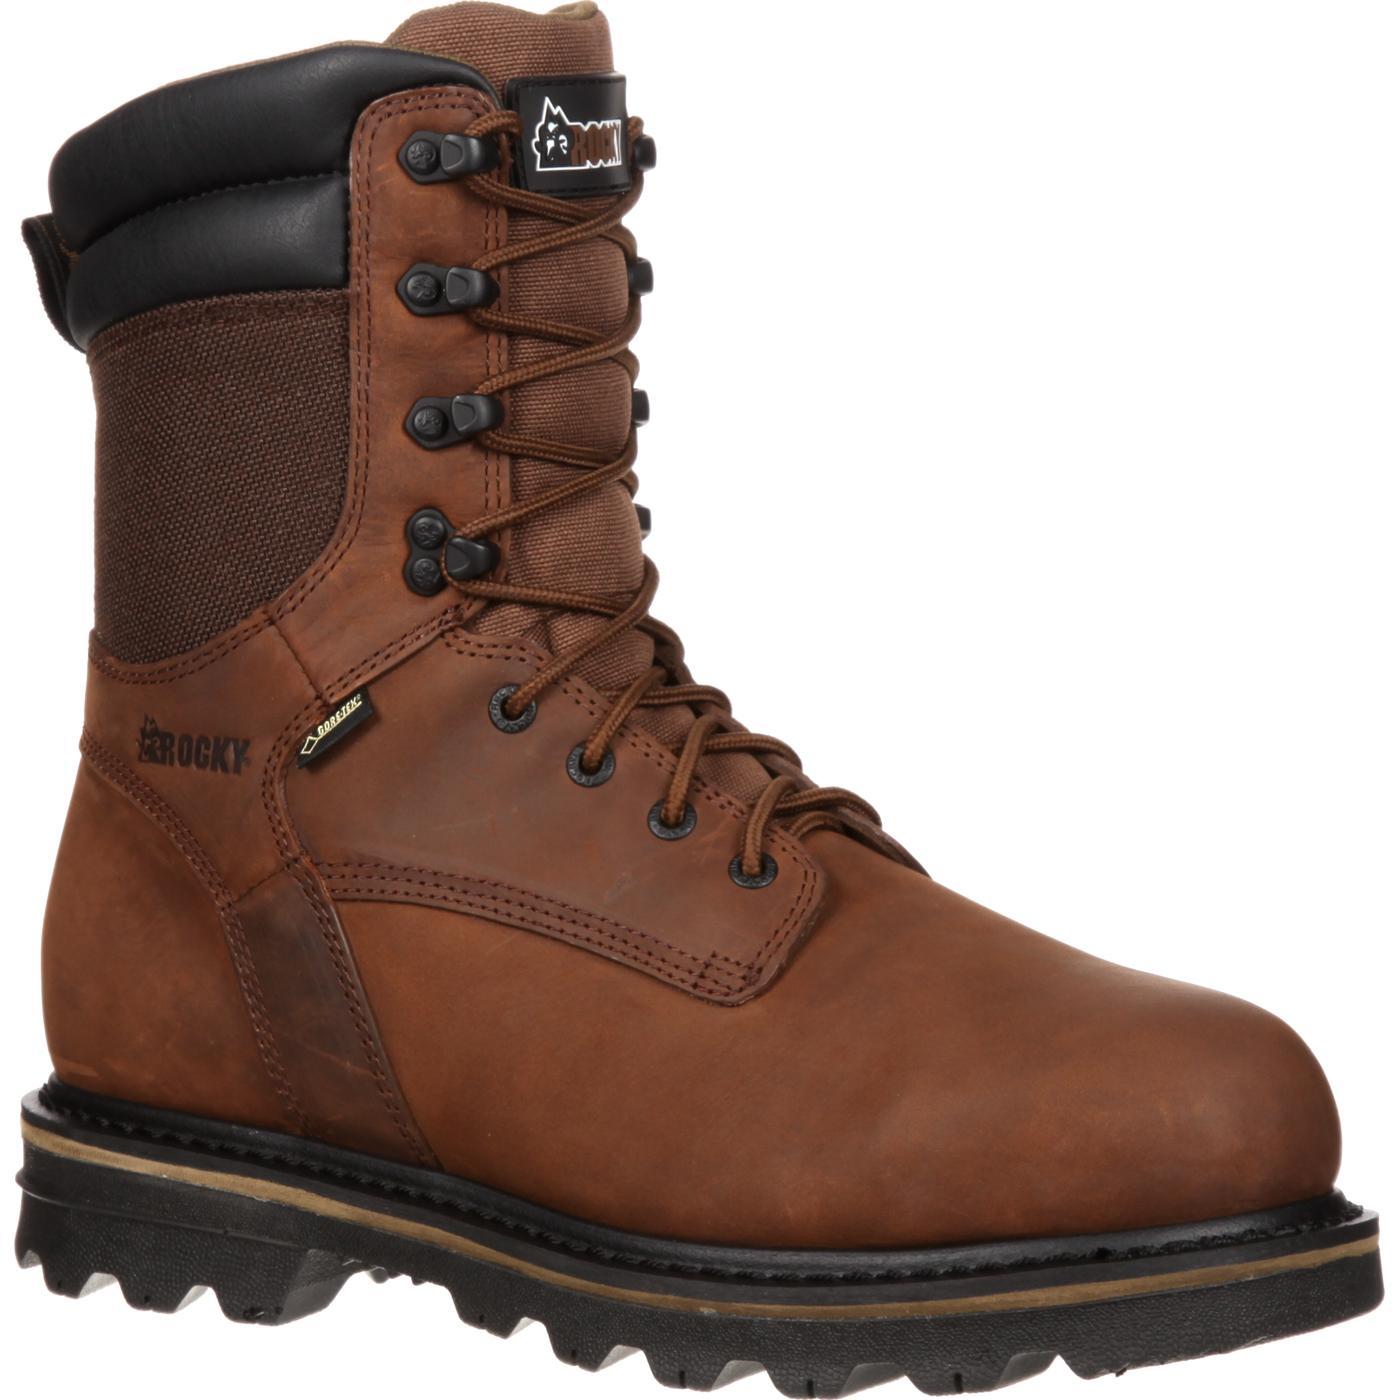 Waterproof Insulated Hunting Boots, Rocky CornStalker #RKYS087